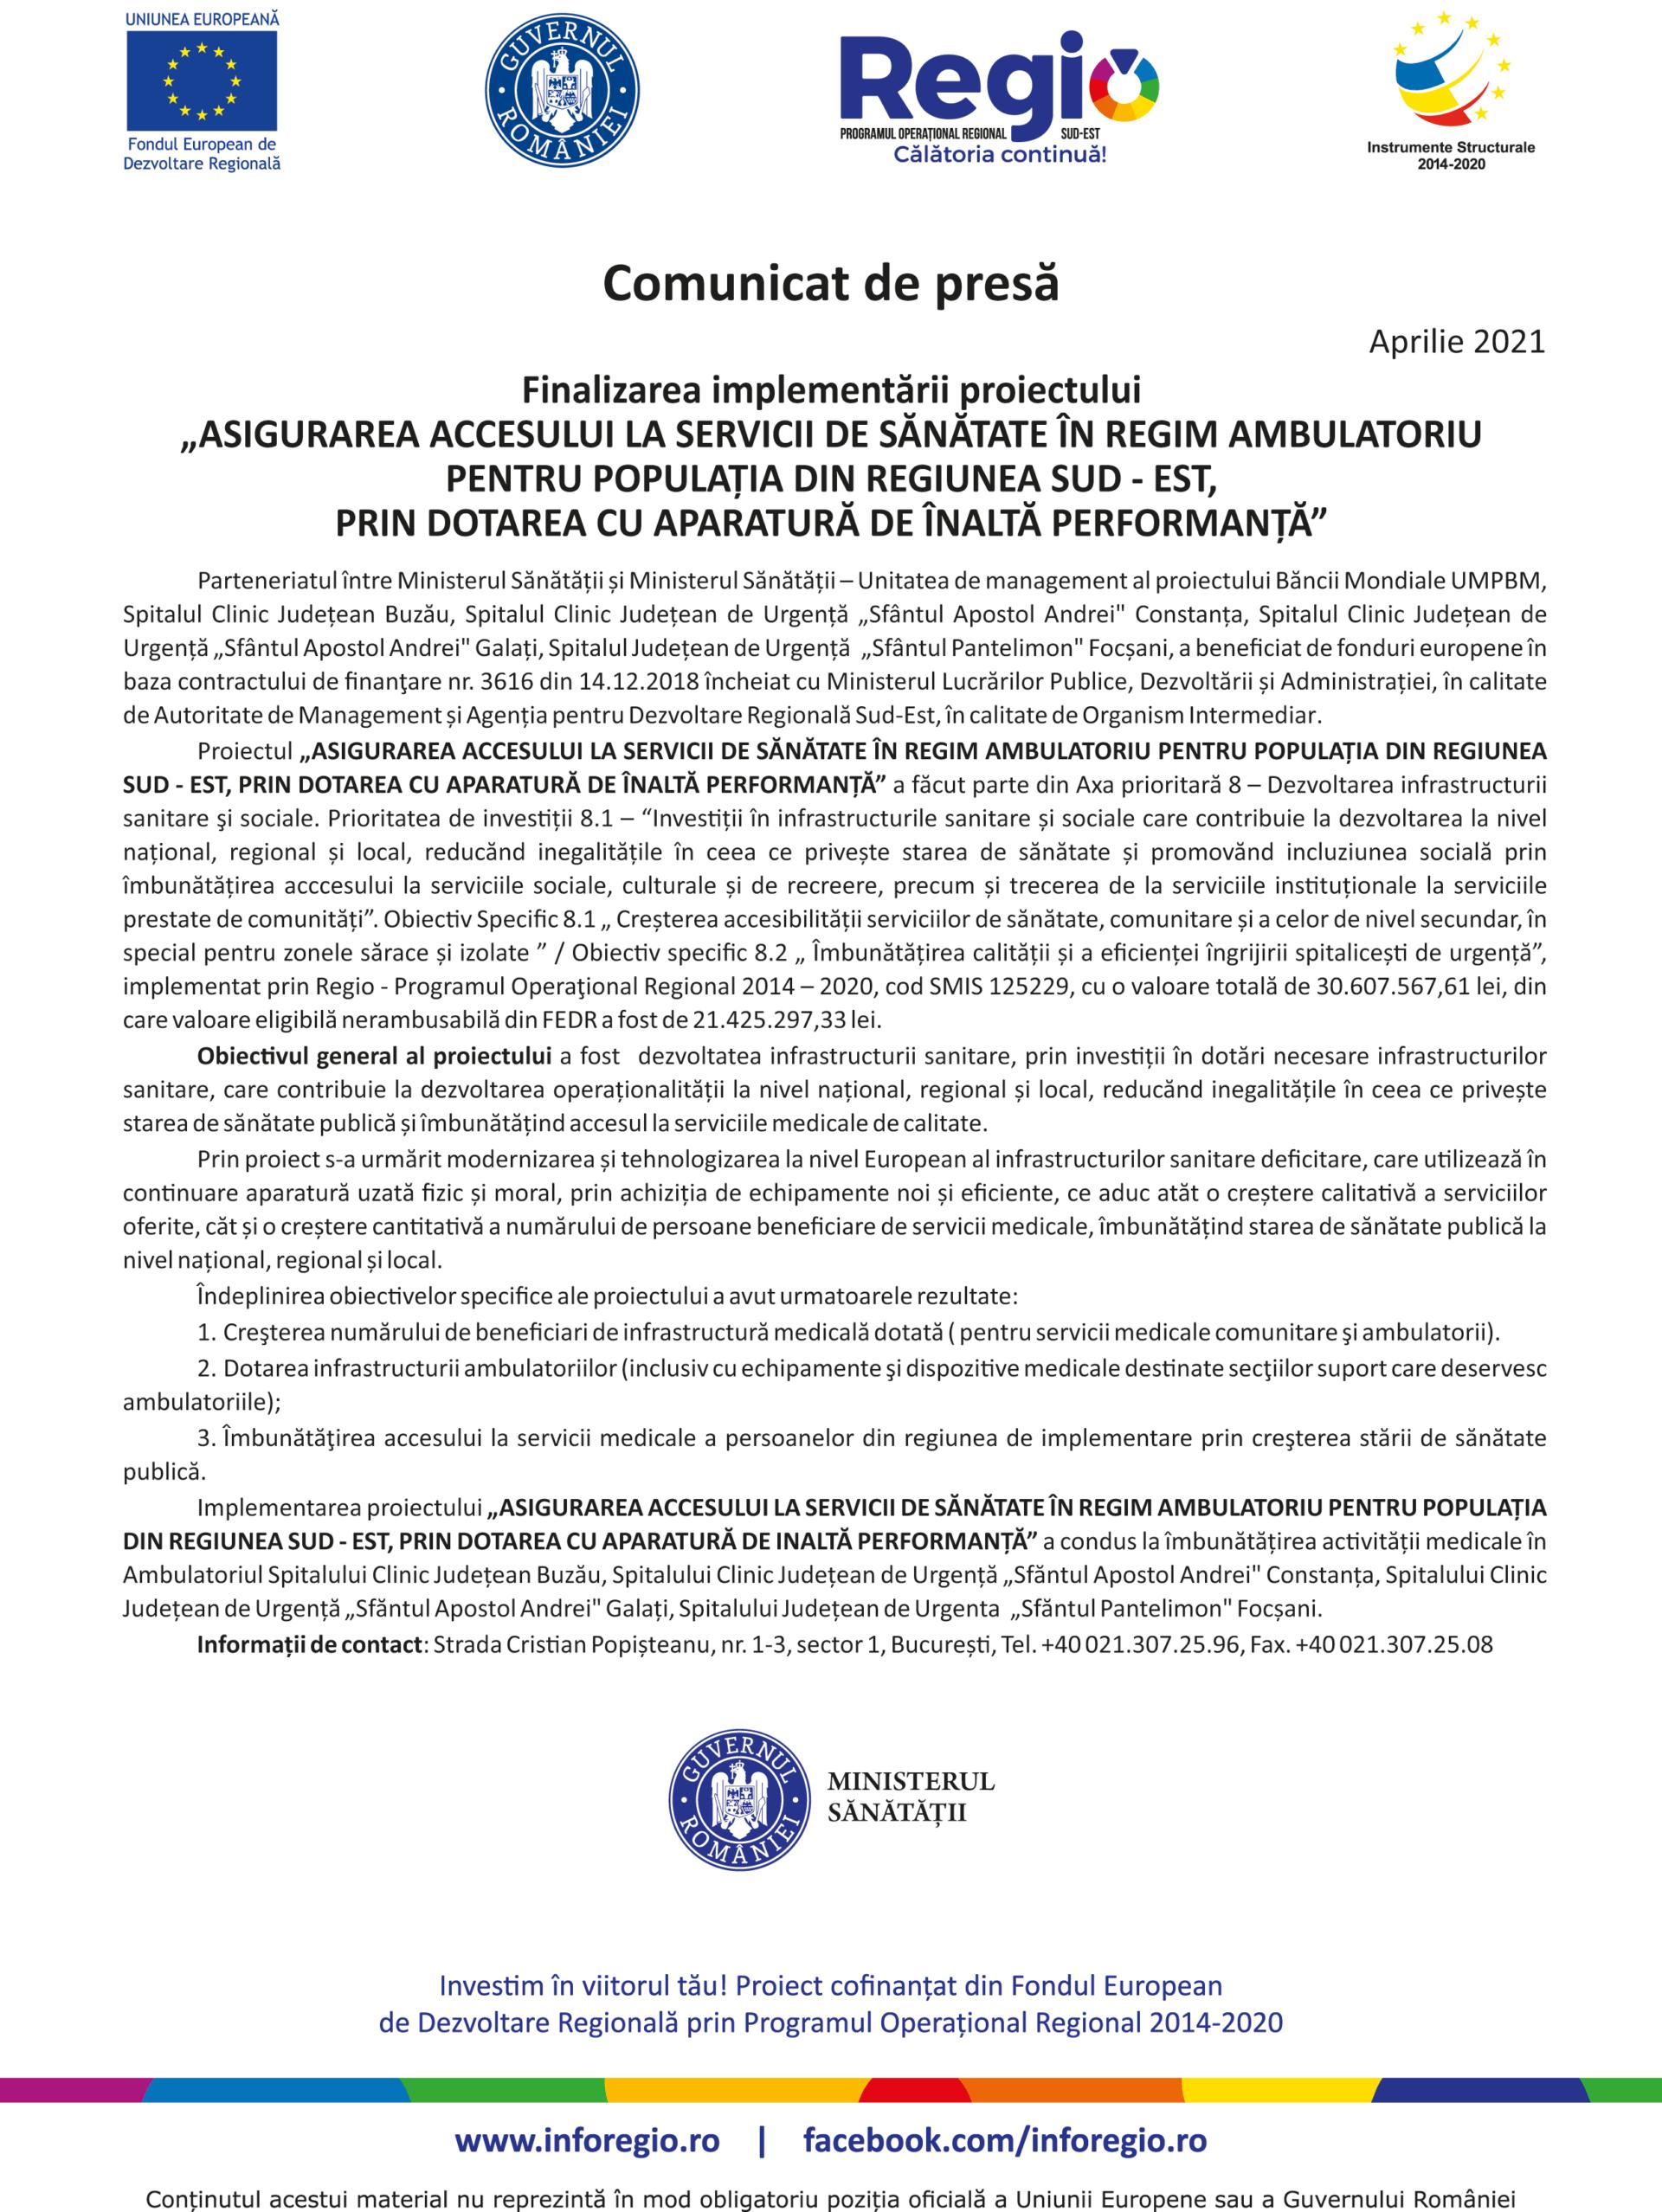 comunicat-presa-ministerul-sanatatii-inchidere-125229-(1)